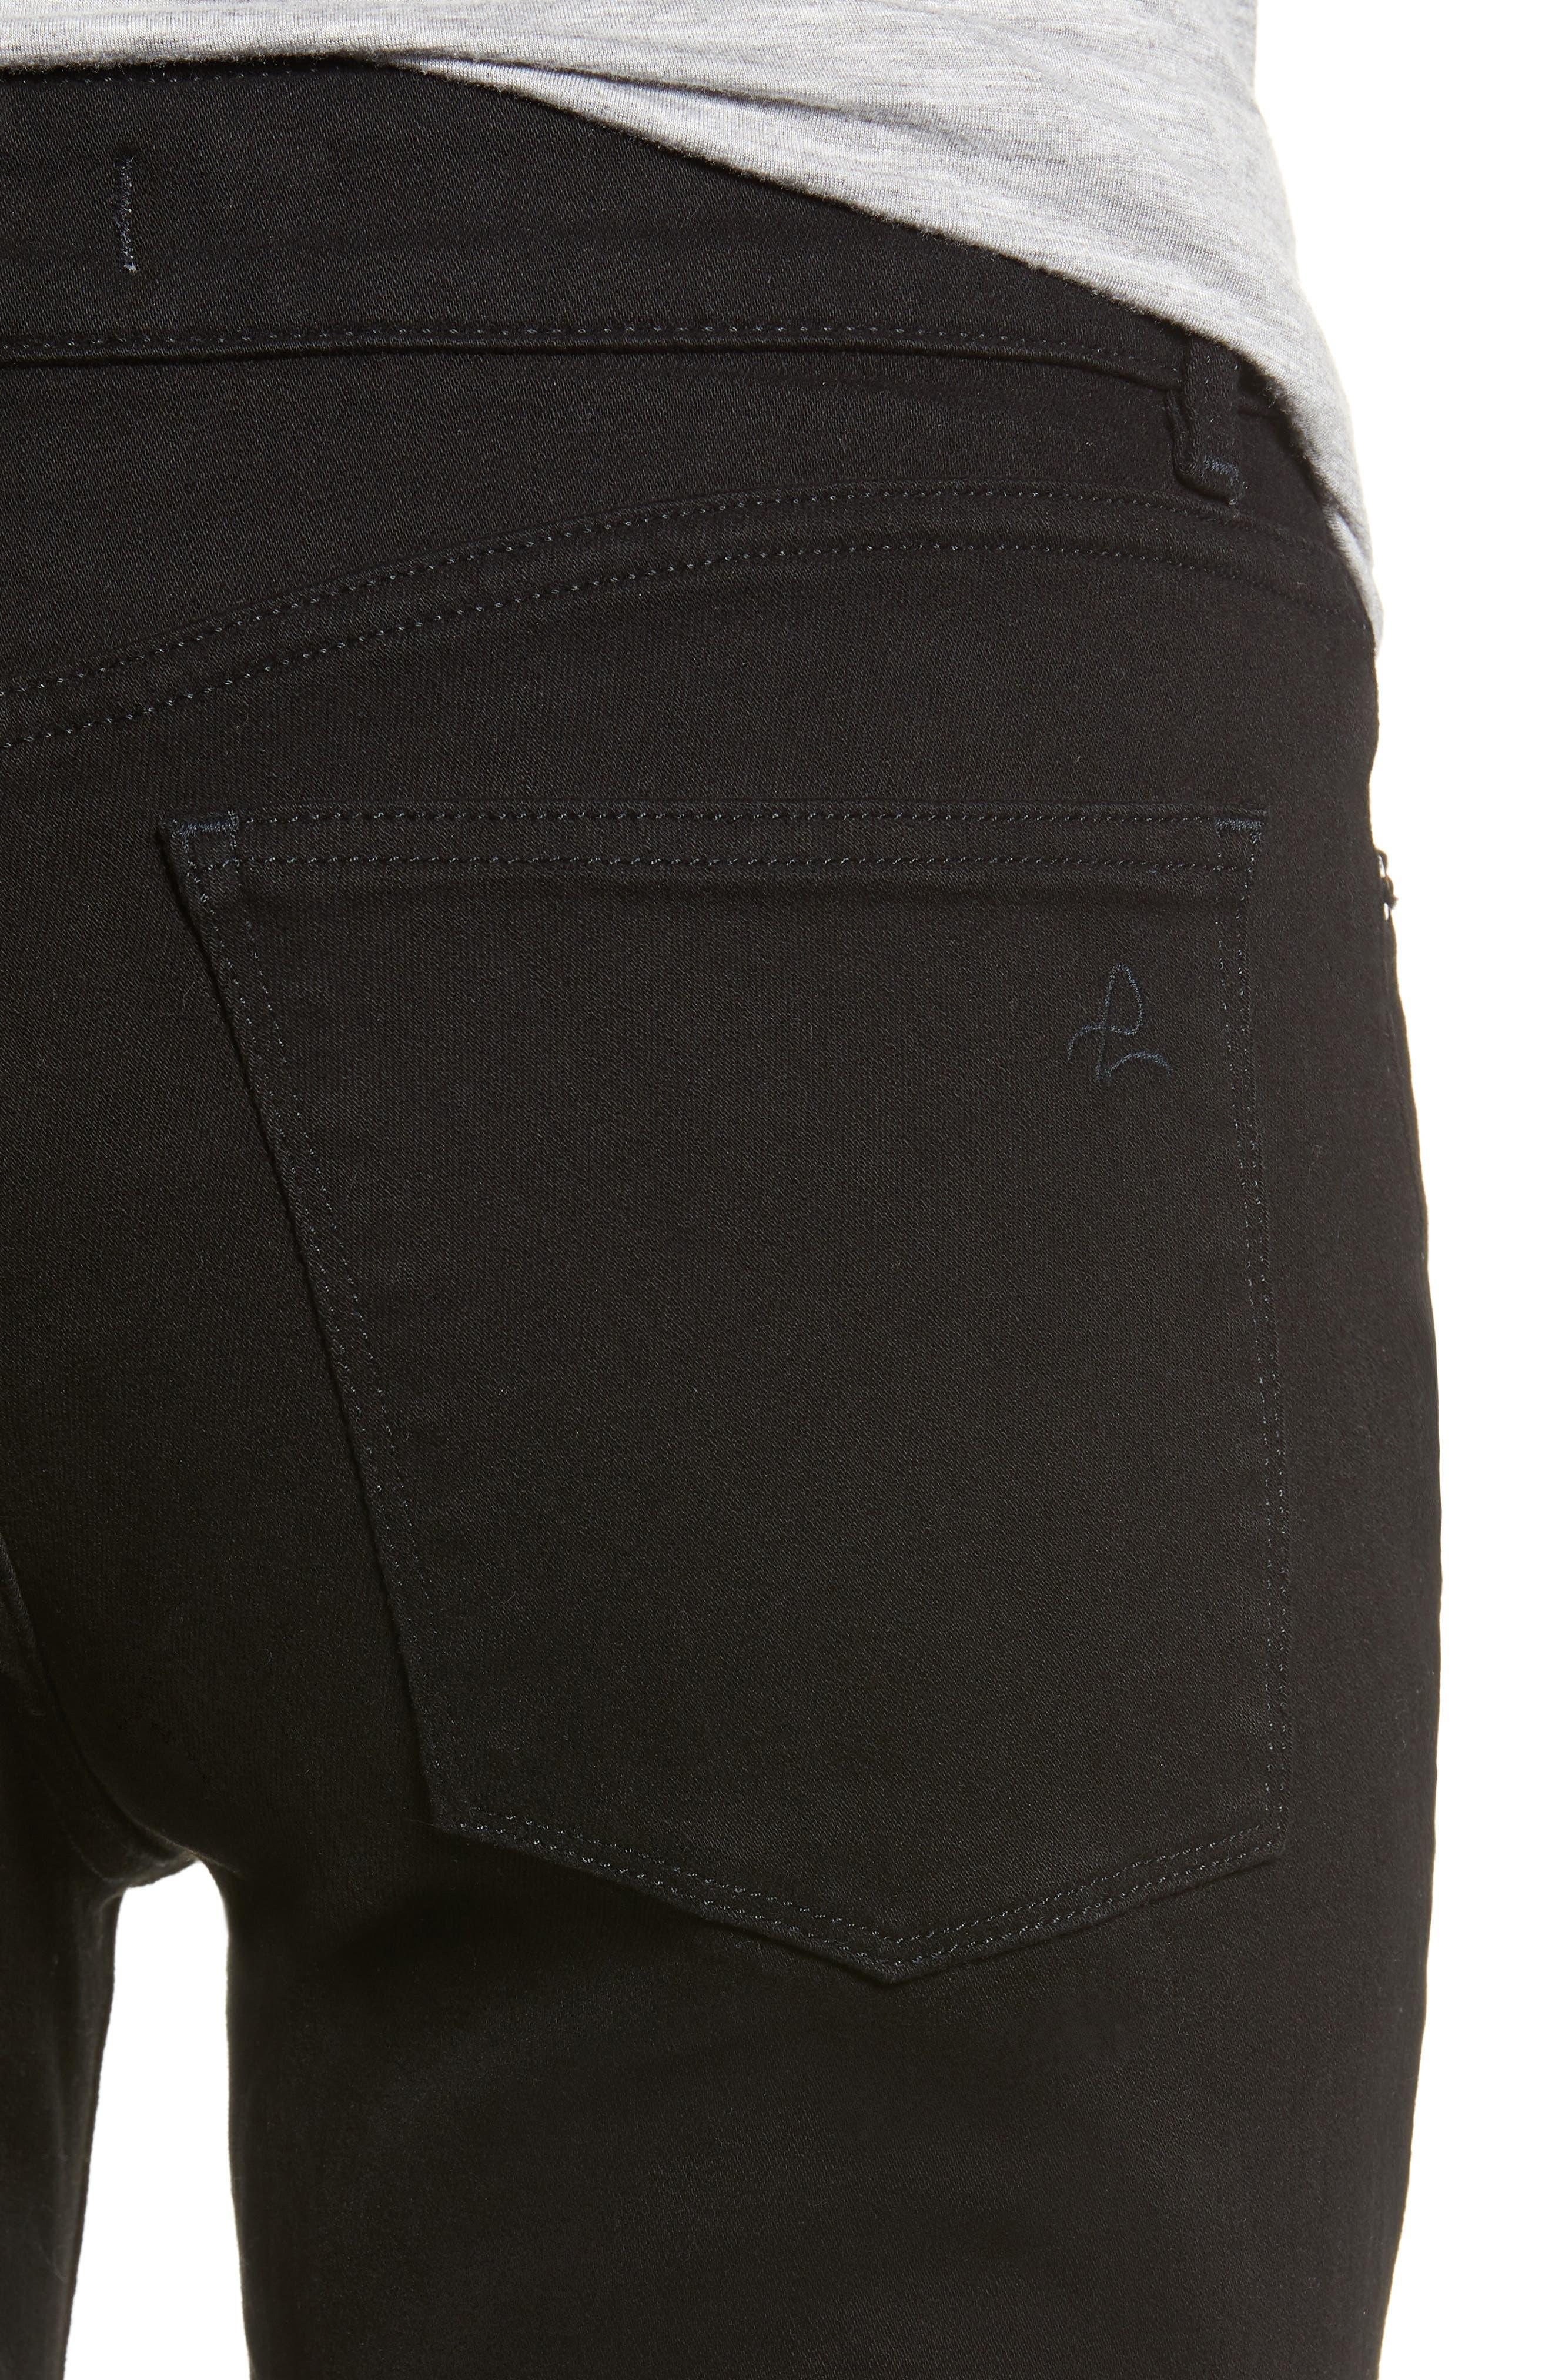 Lara Instasculpt High Waist Crop Flare Jeans,                             Alternate thumbnail 4, color,                             HENDERSON